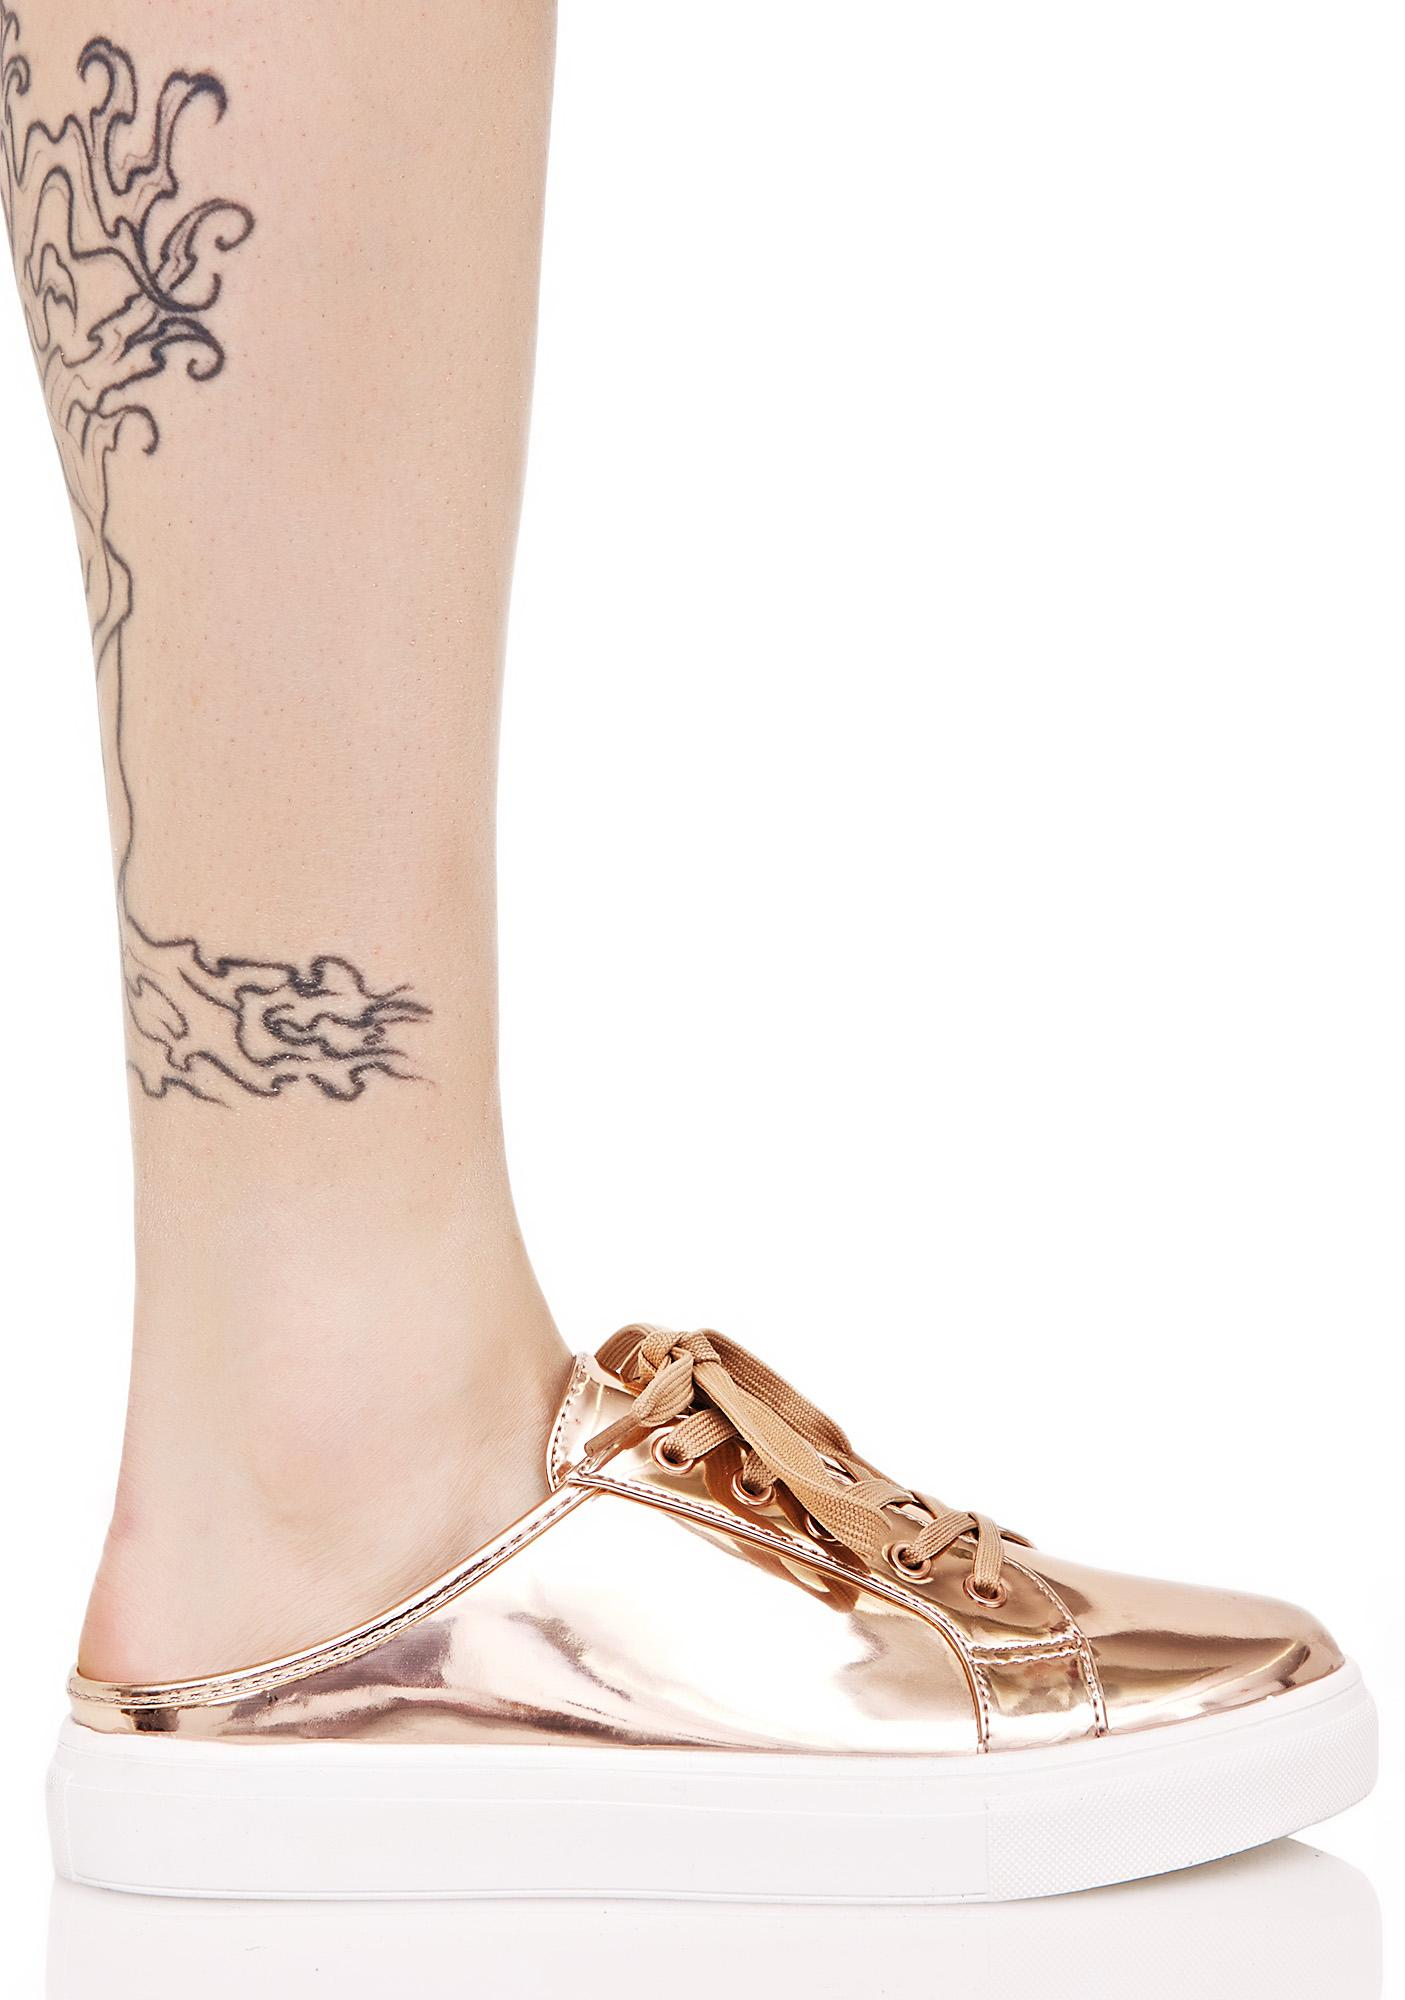 Golden Runaround Slip-On Sneakers